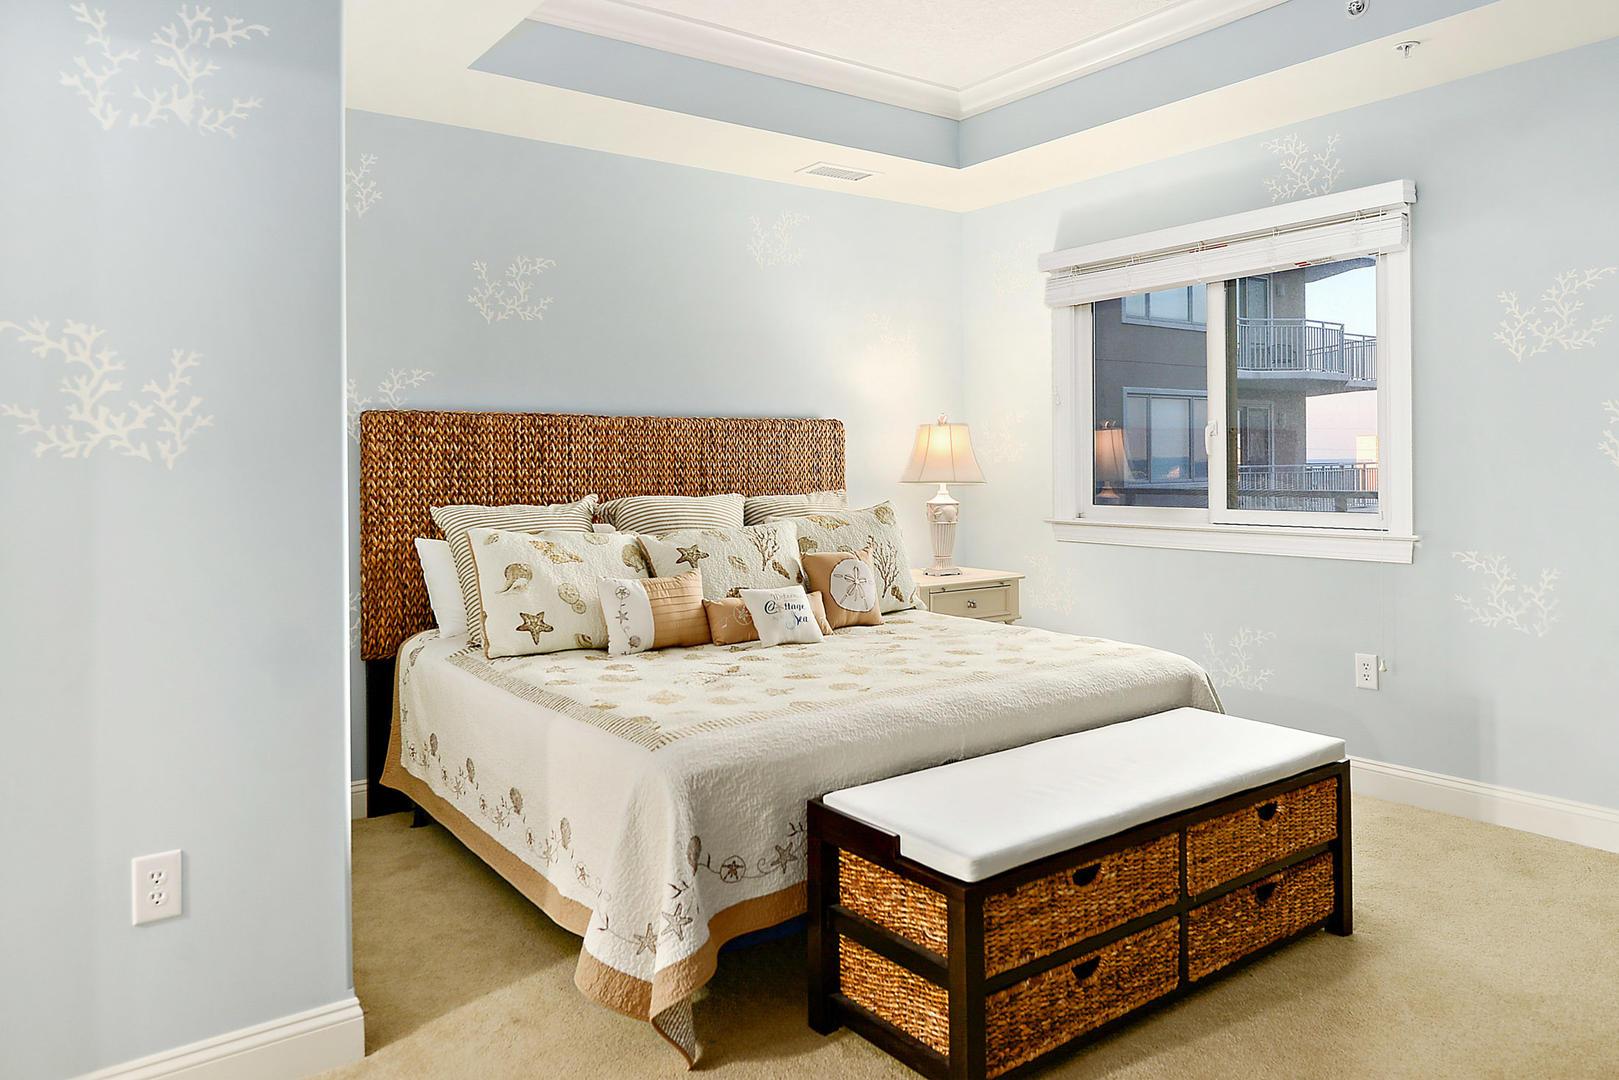 Rivendell 710 - Bedroom 2